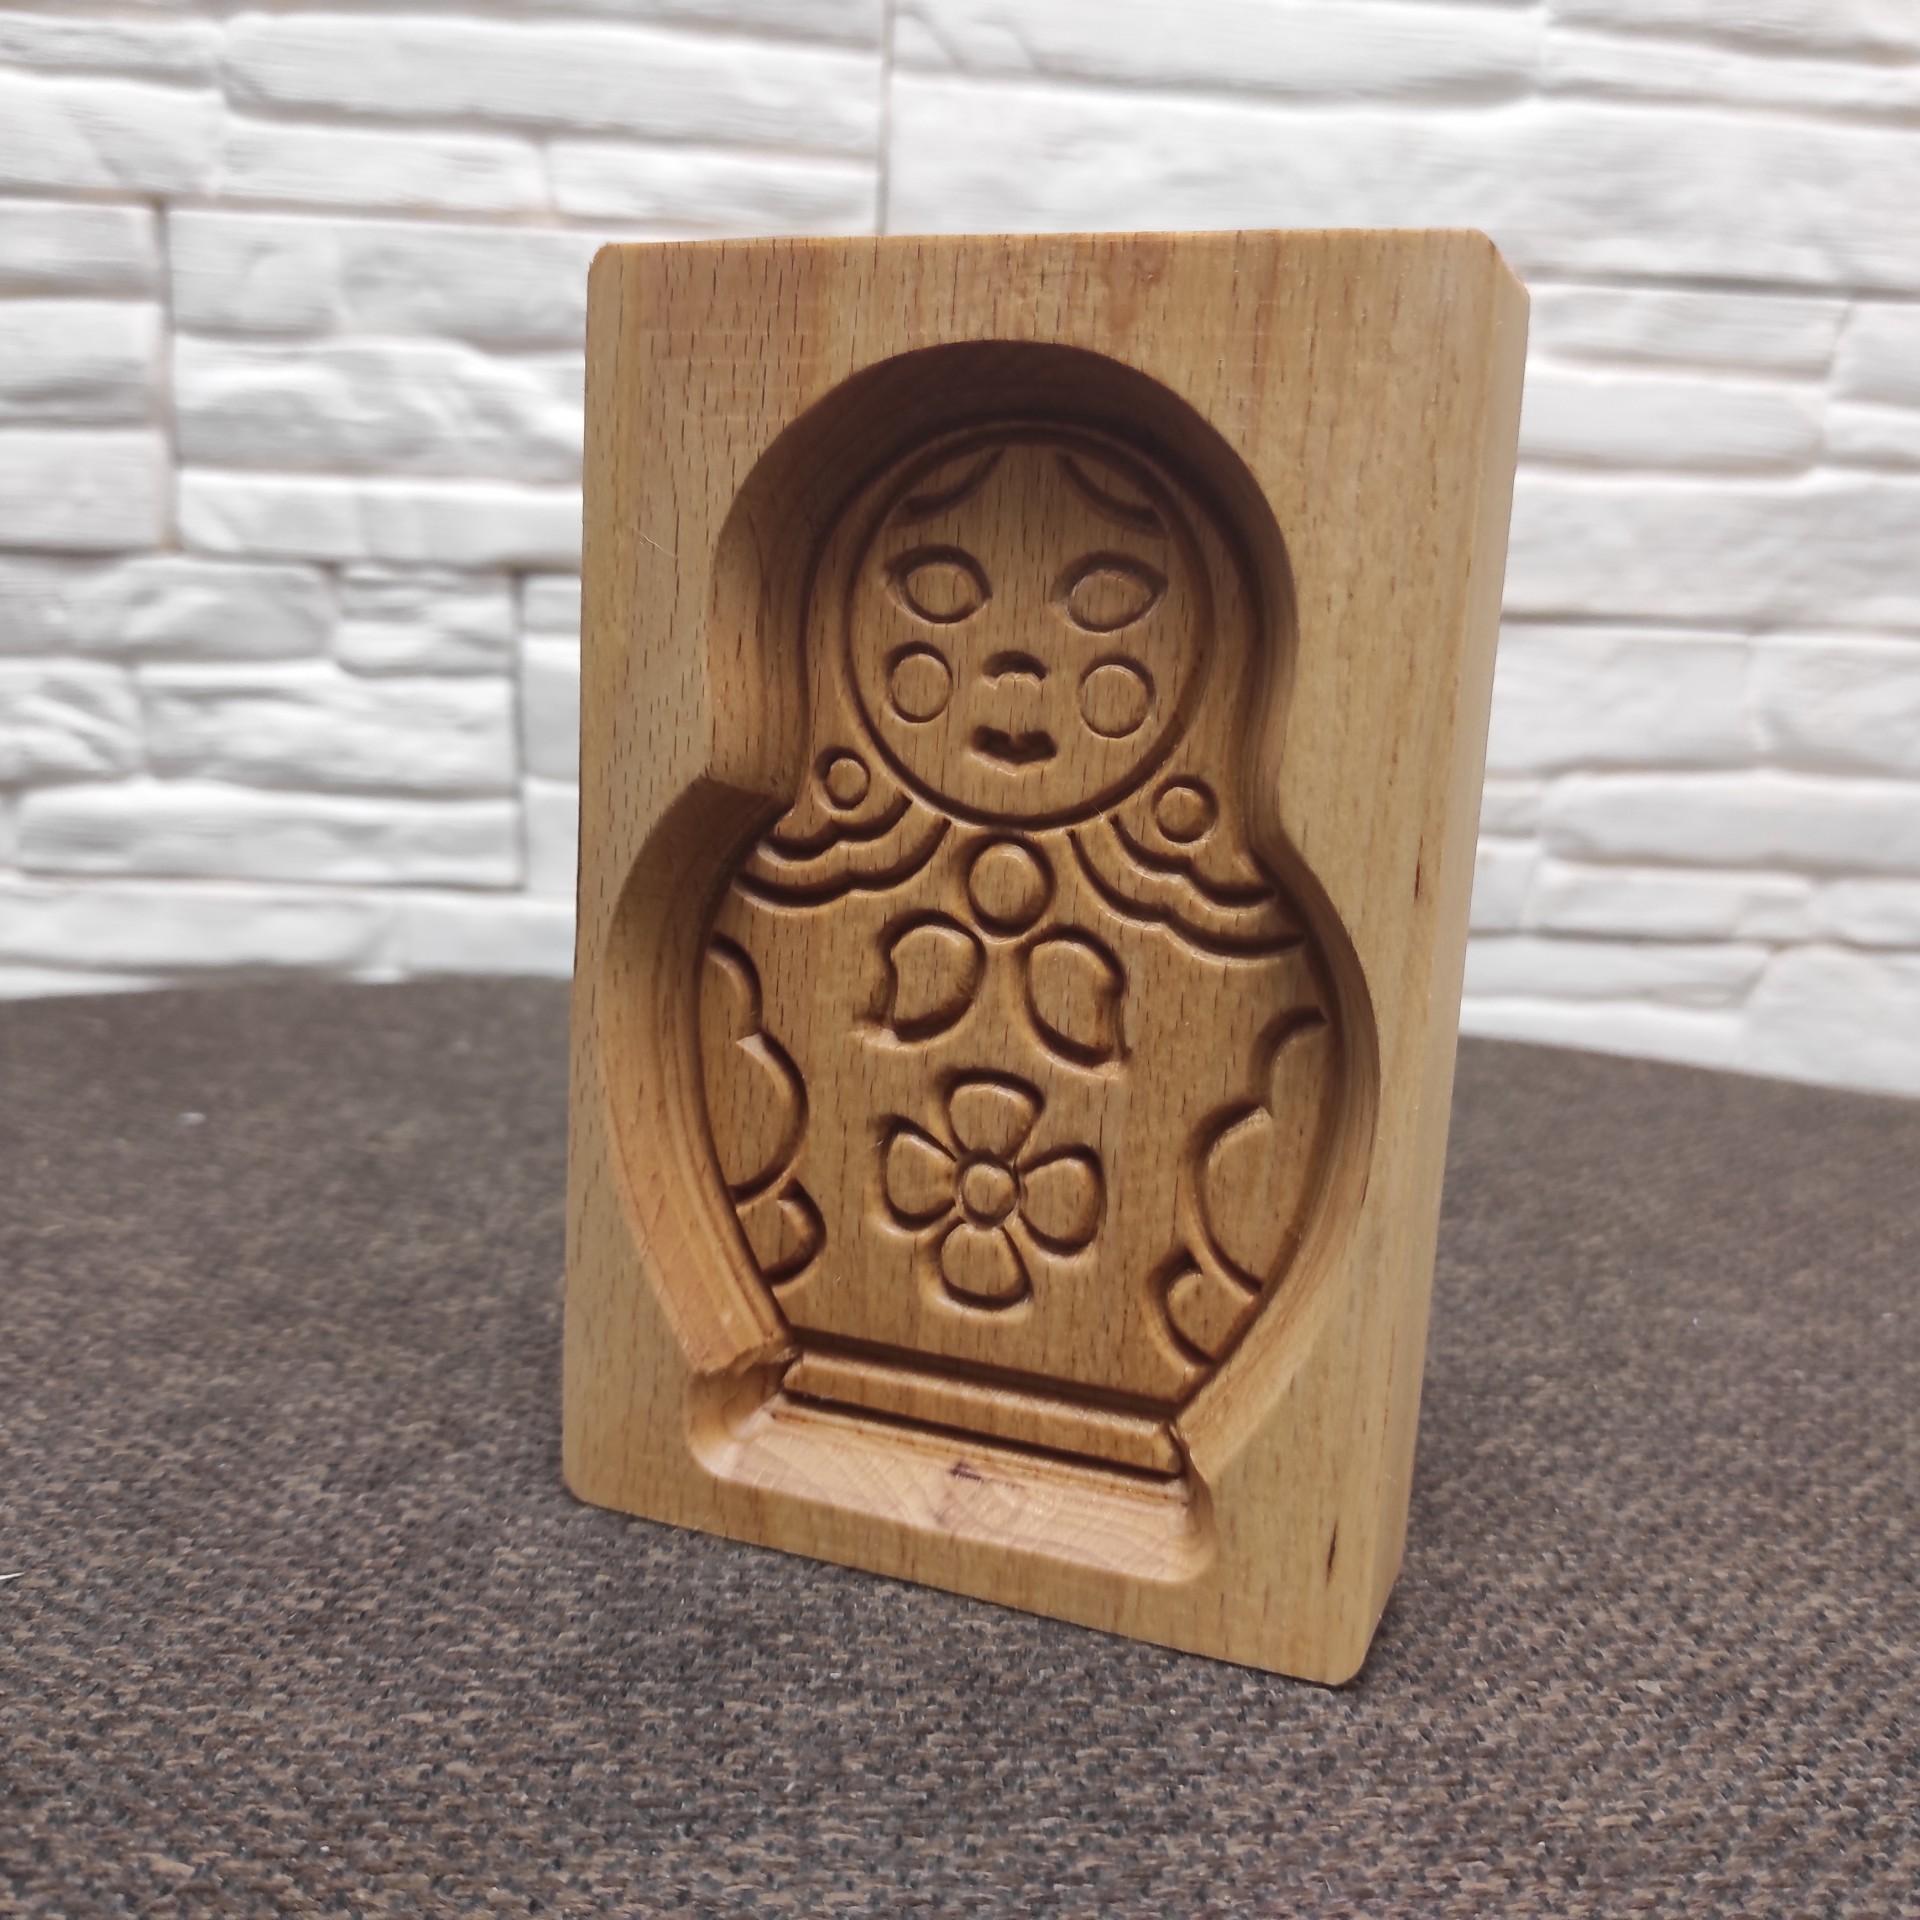 Фото формы для печати пряника Матрешка общий вид